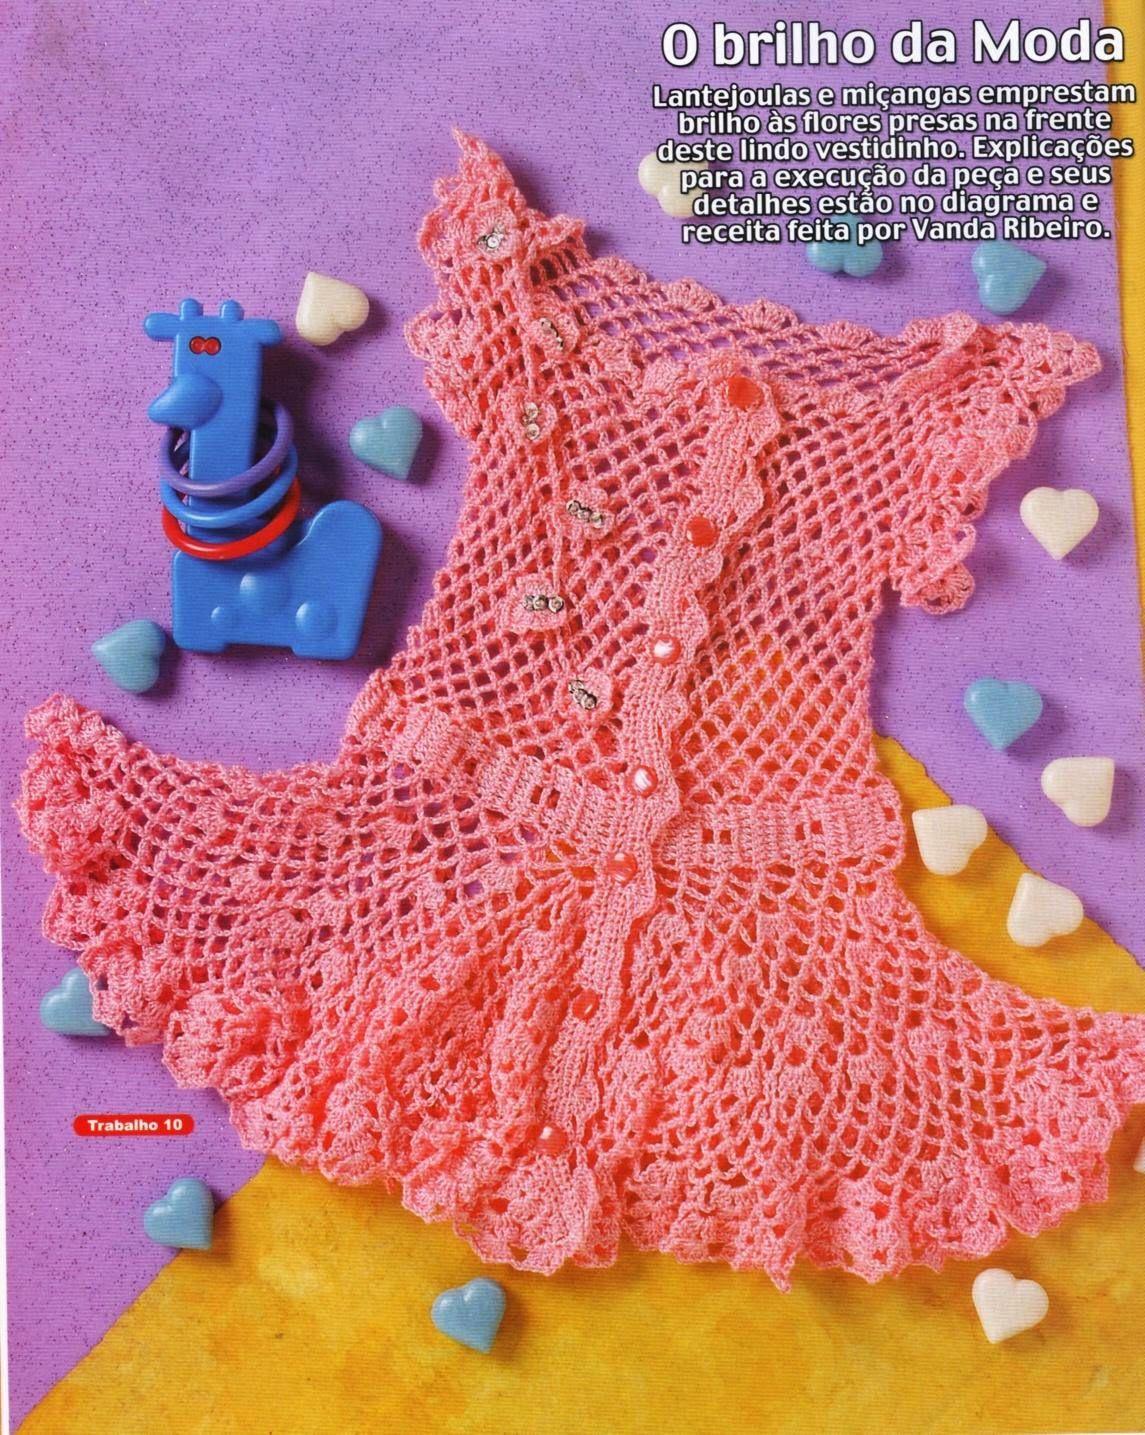 Receita De Croche Infantil Vestido De Croche Tamanho 7 Meses